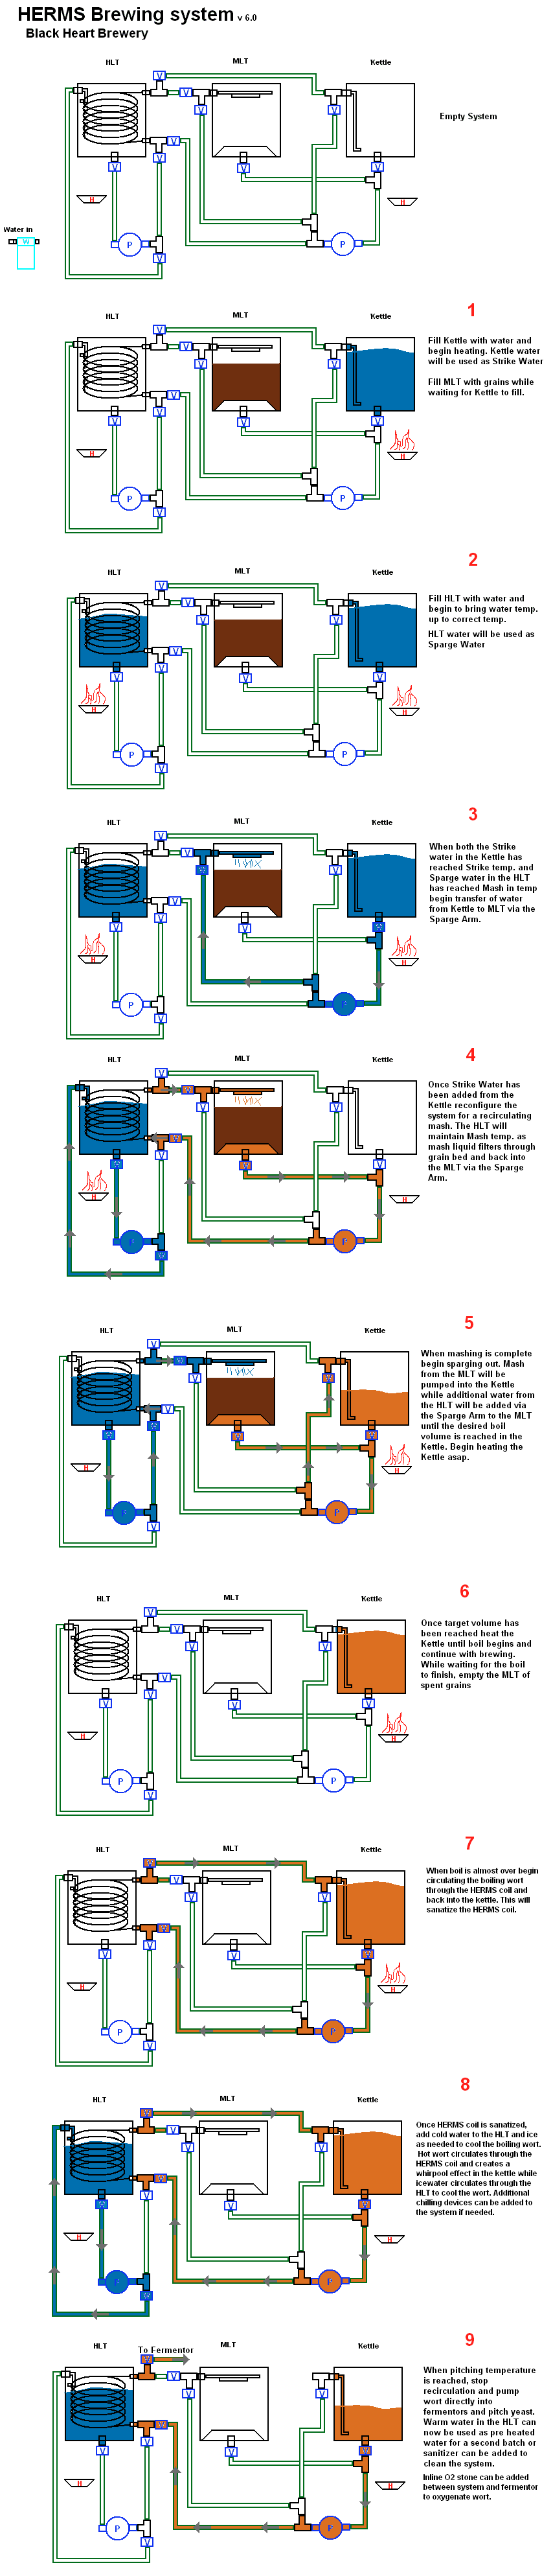 Biology coursework fermentation